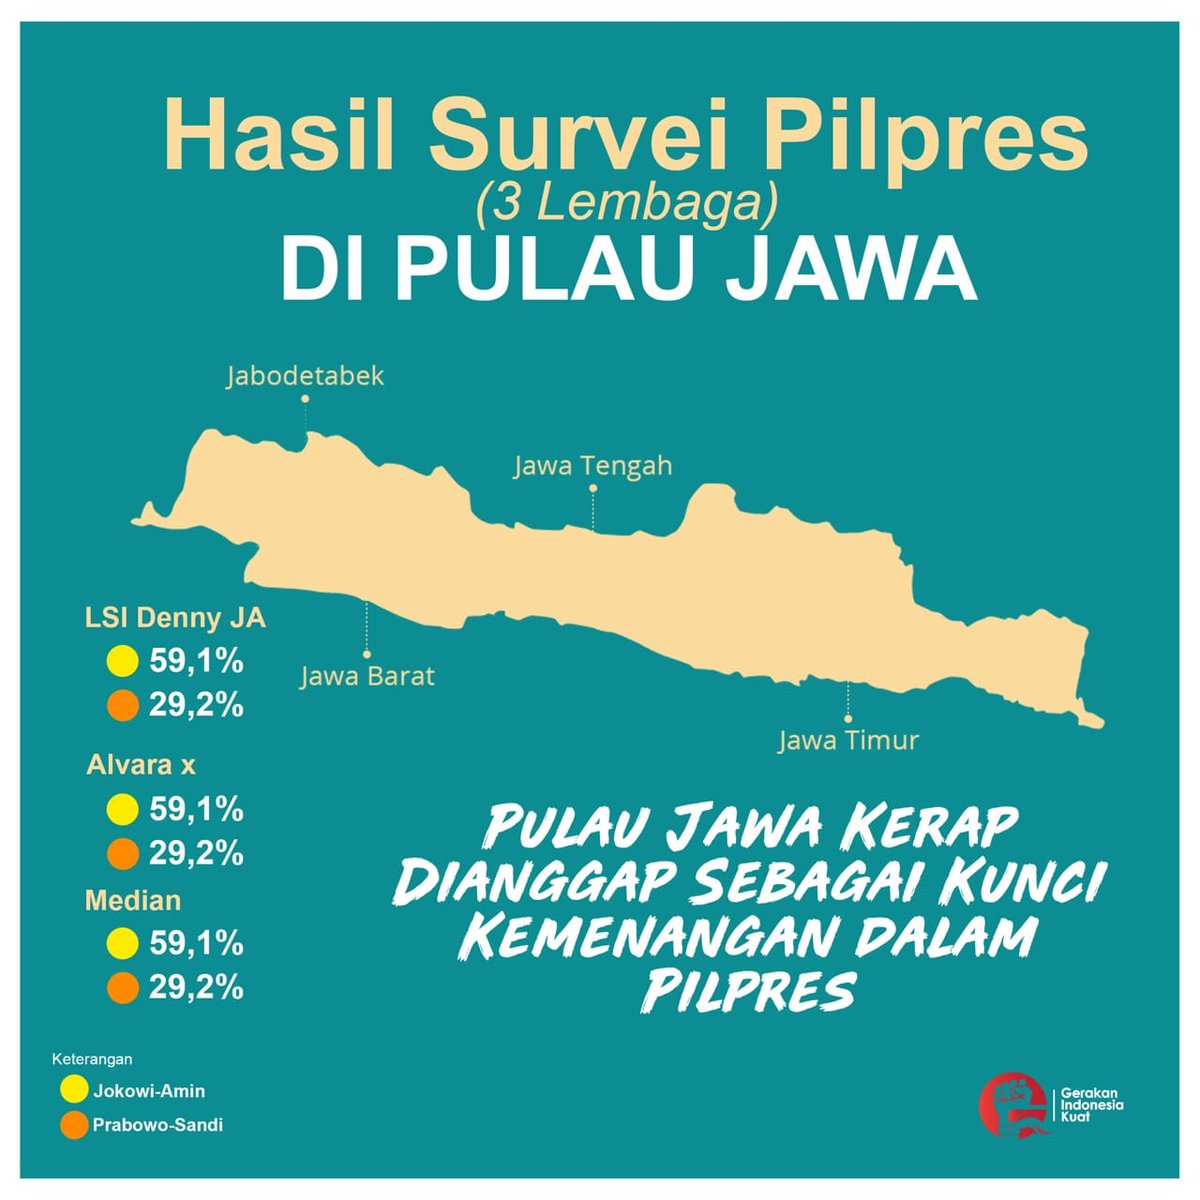 Hmmm...  #jokowipresidenku #rekanjokowi #rekanjokowisulsel #ayoteruskerja #indonesiakuat https://t.co/TTs7QxWfVZ